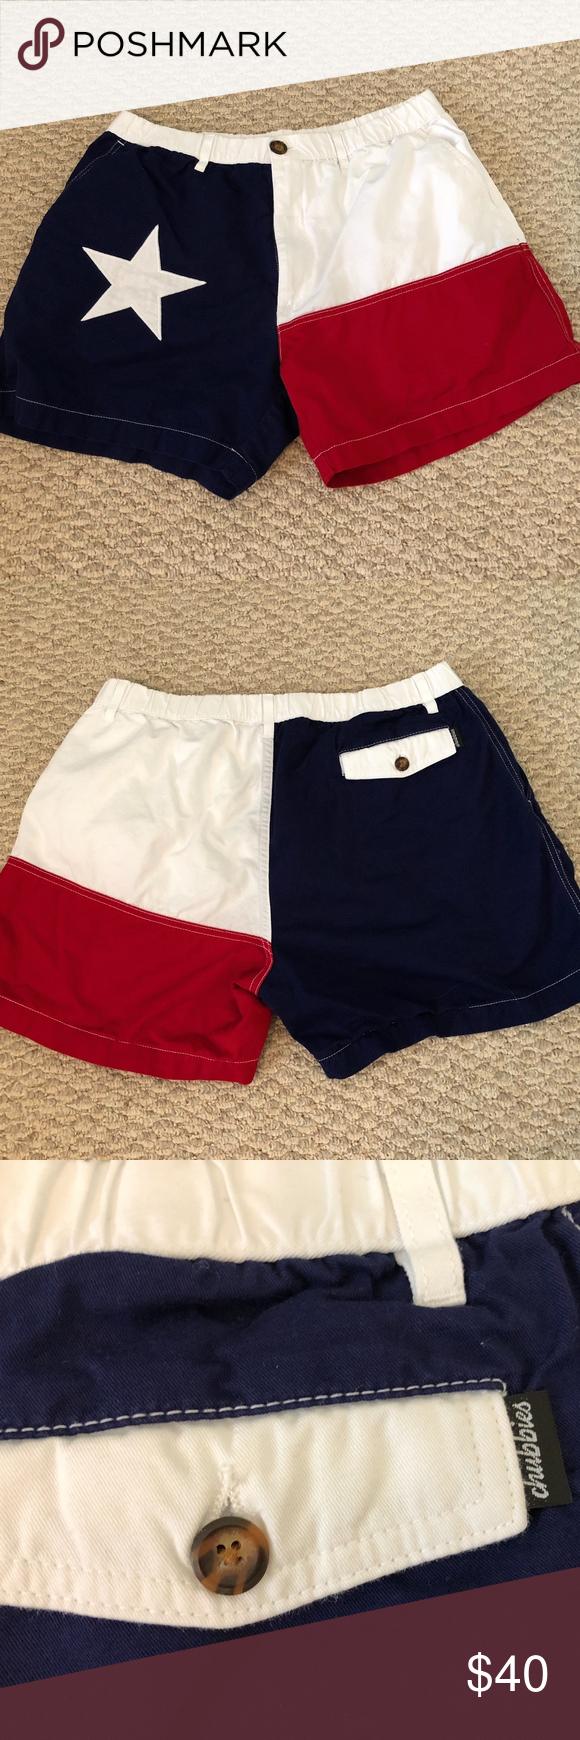 Chubbies Mens Shorts Texas Flag Xl Mens Shorts Chubbies Shorts Shorts